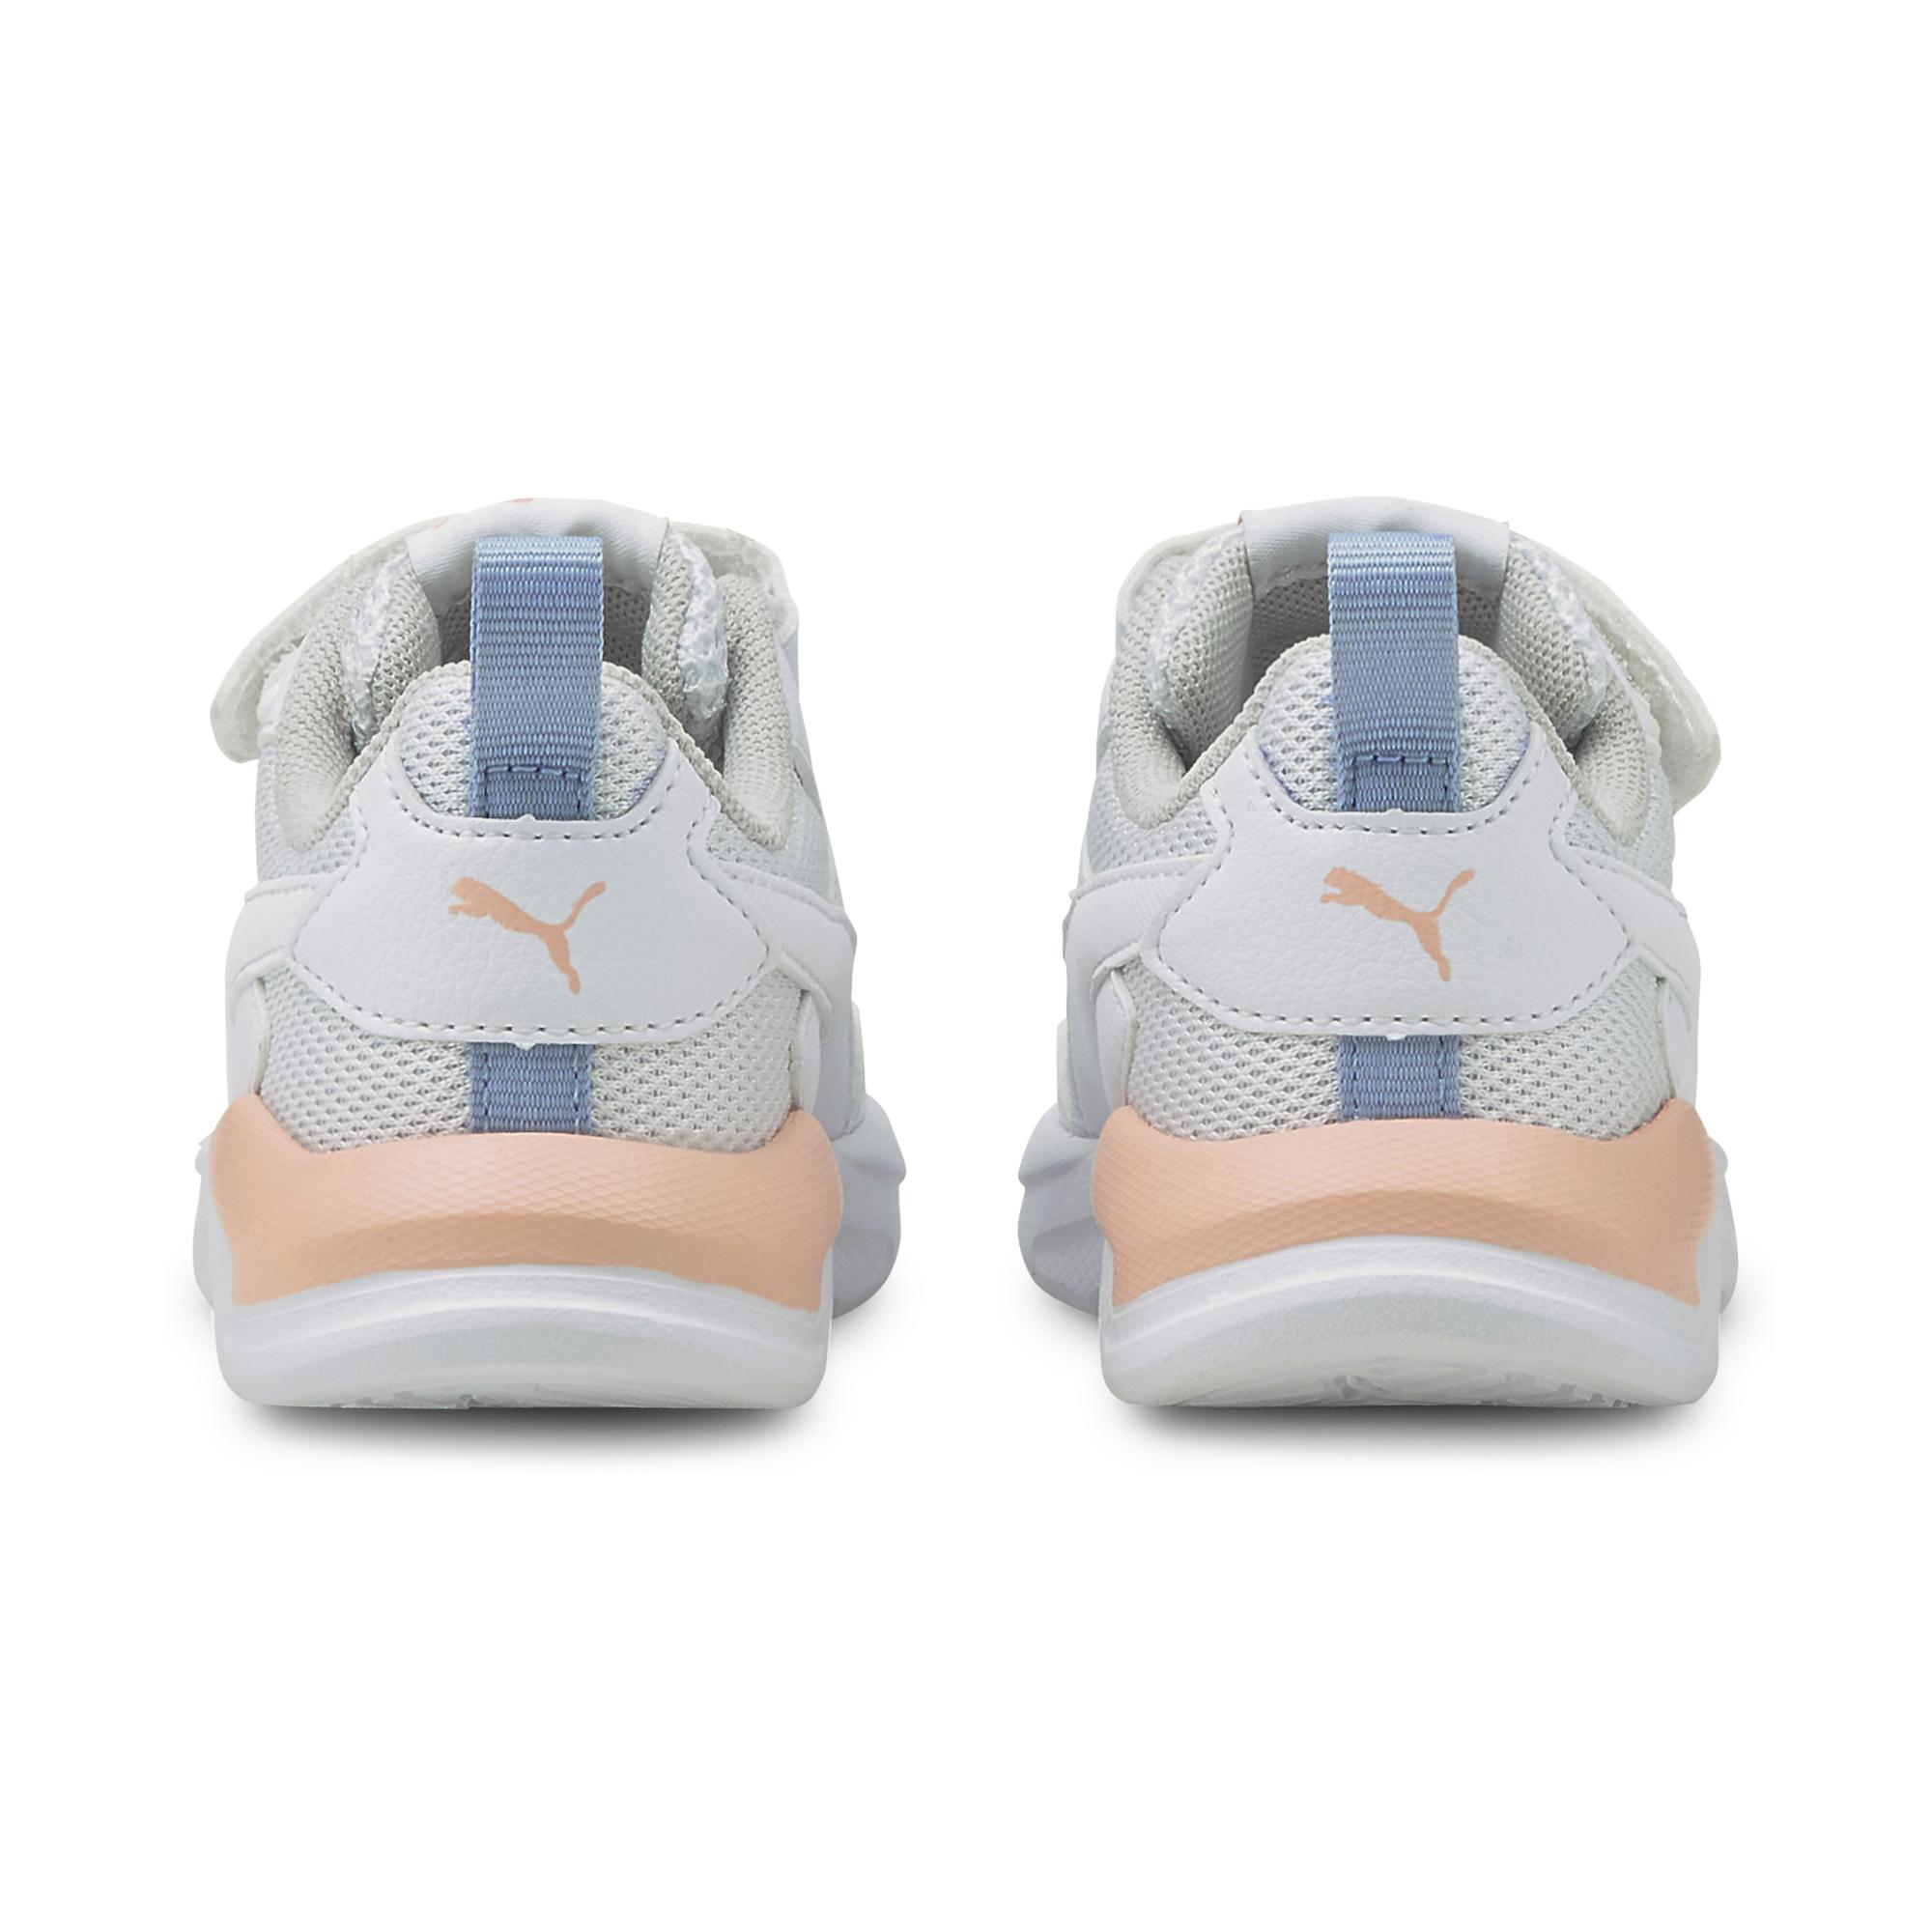 Puma X-Ray Lite babies sneakers, white, 23